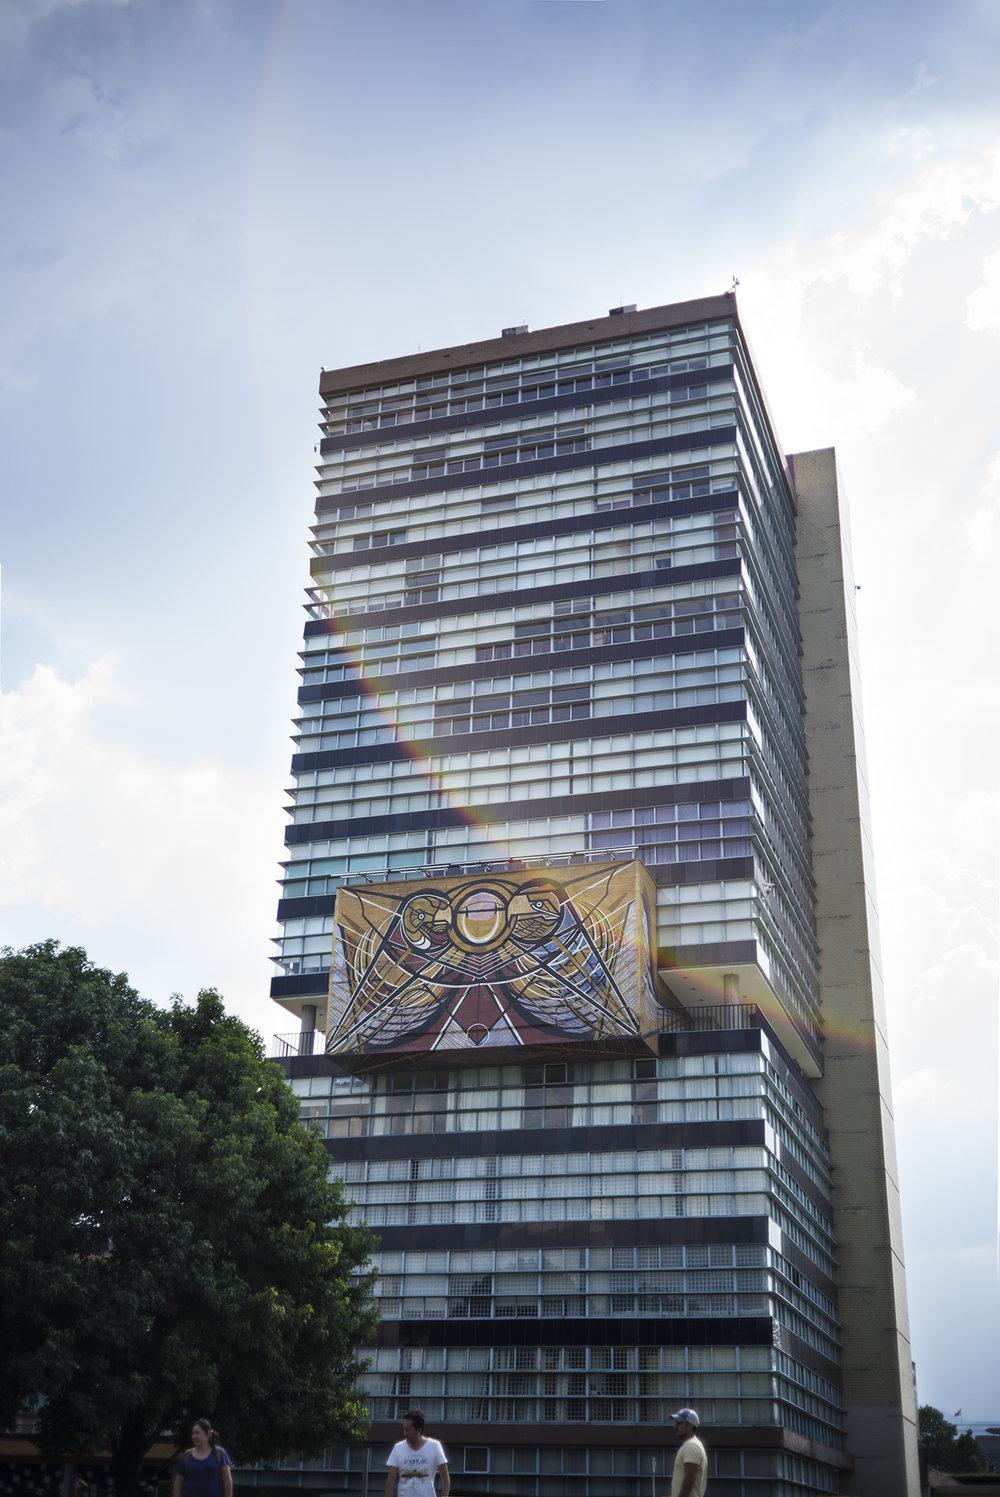 L1005087 UNAM_mexico_b.jpg